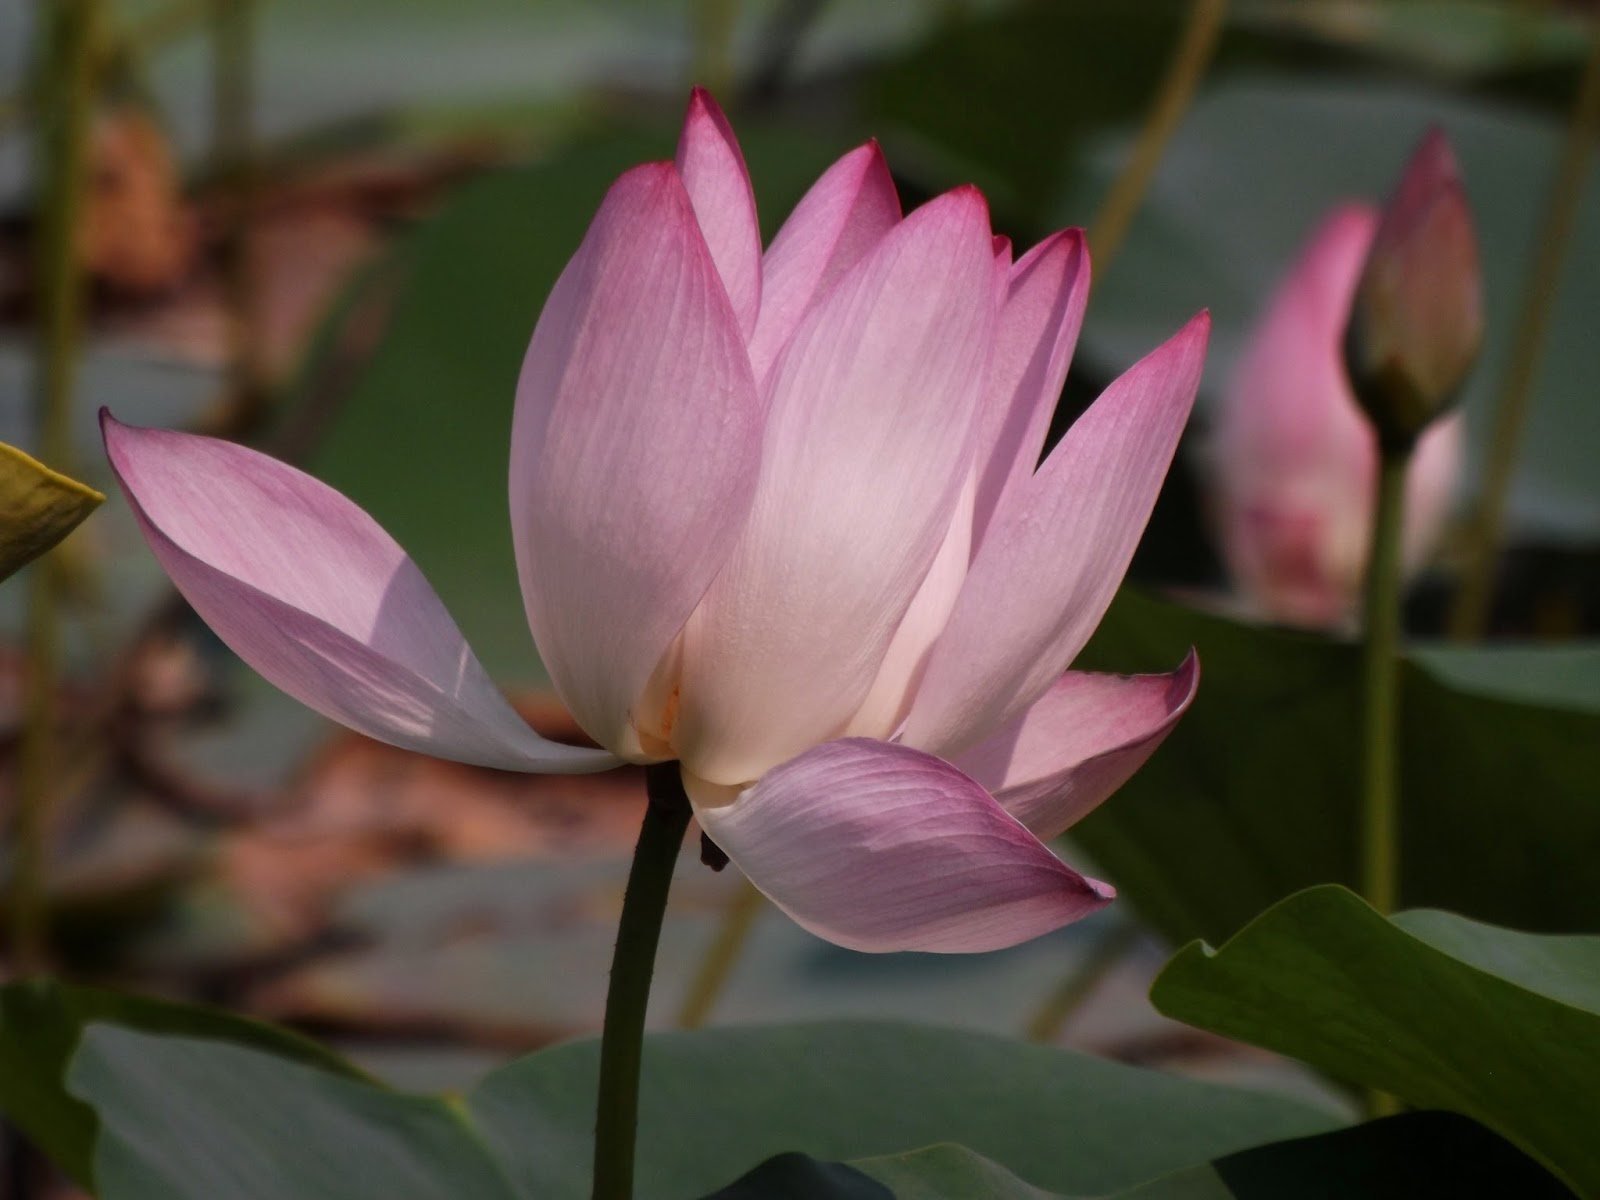 Padma lotus nelumbo nucifera fully bloomed flower is 15 20 cm across sepals 4 5 ovate elliptical persistent petals many 4 15 cm long elliptical numerous stamens surround pistil izmirmasajfo